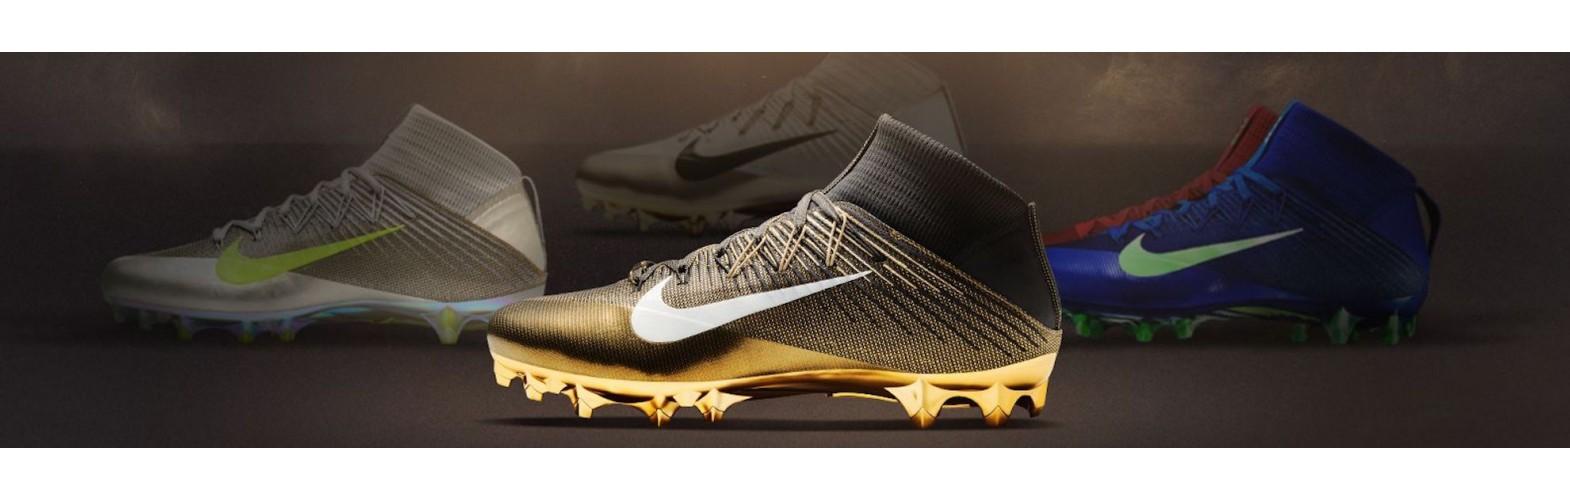 Football Nike Americain Chaussure Chaussure Americain Chaussure Football Nike Football Nike wN0vm8Oyn